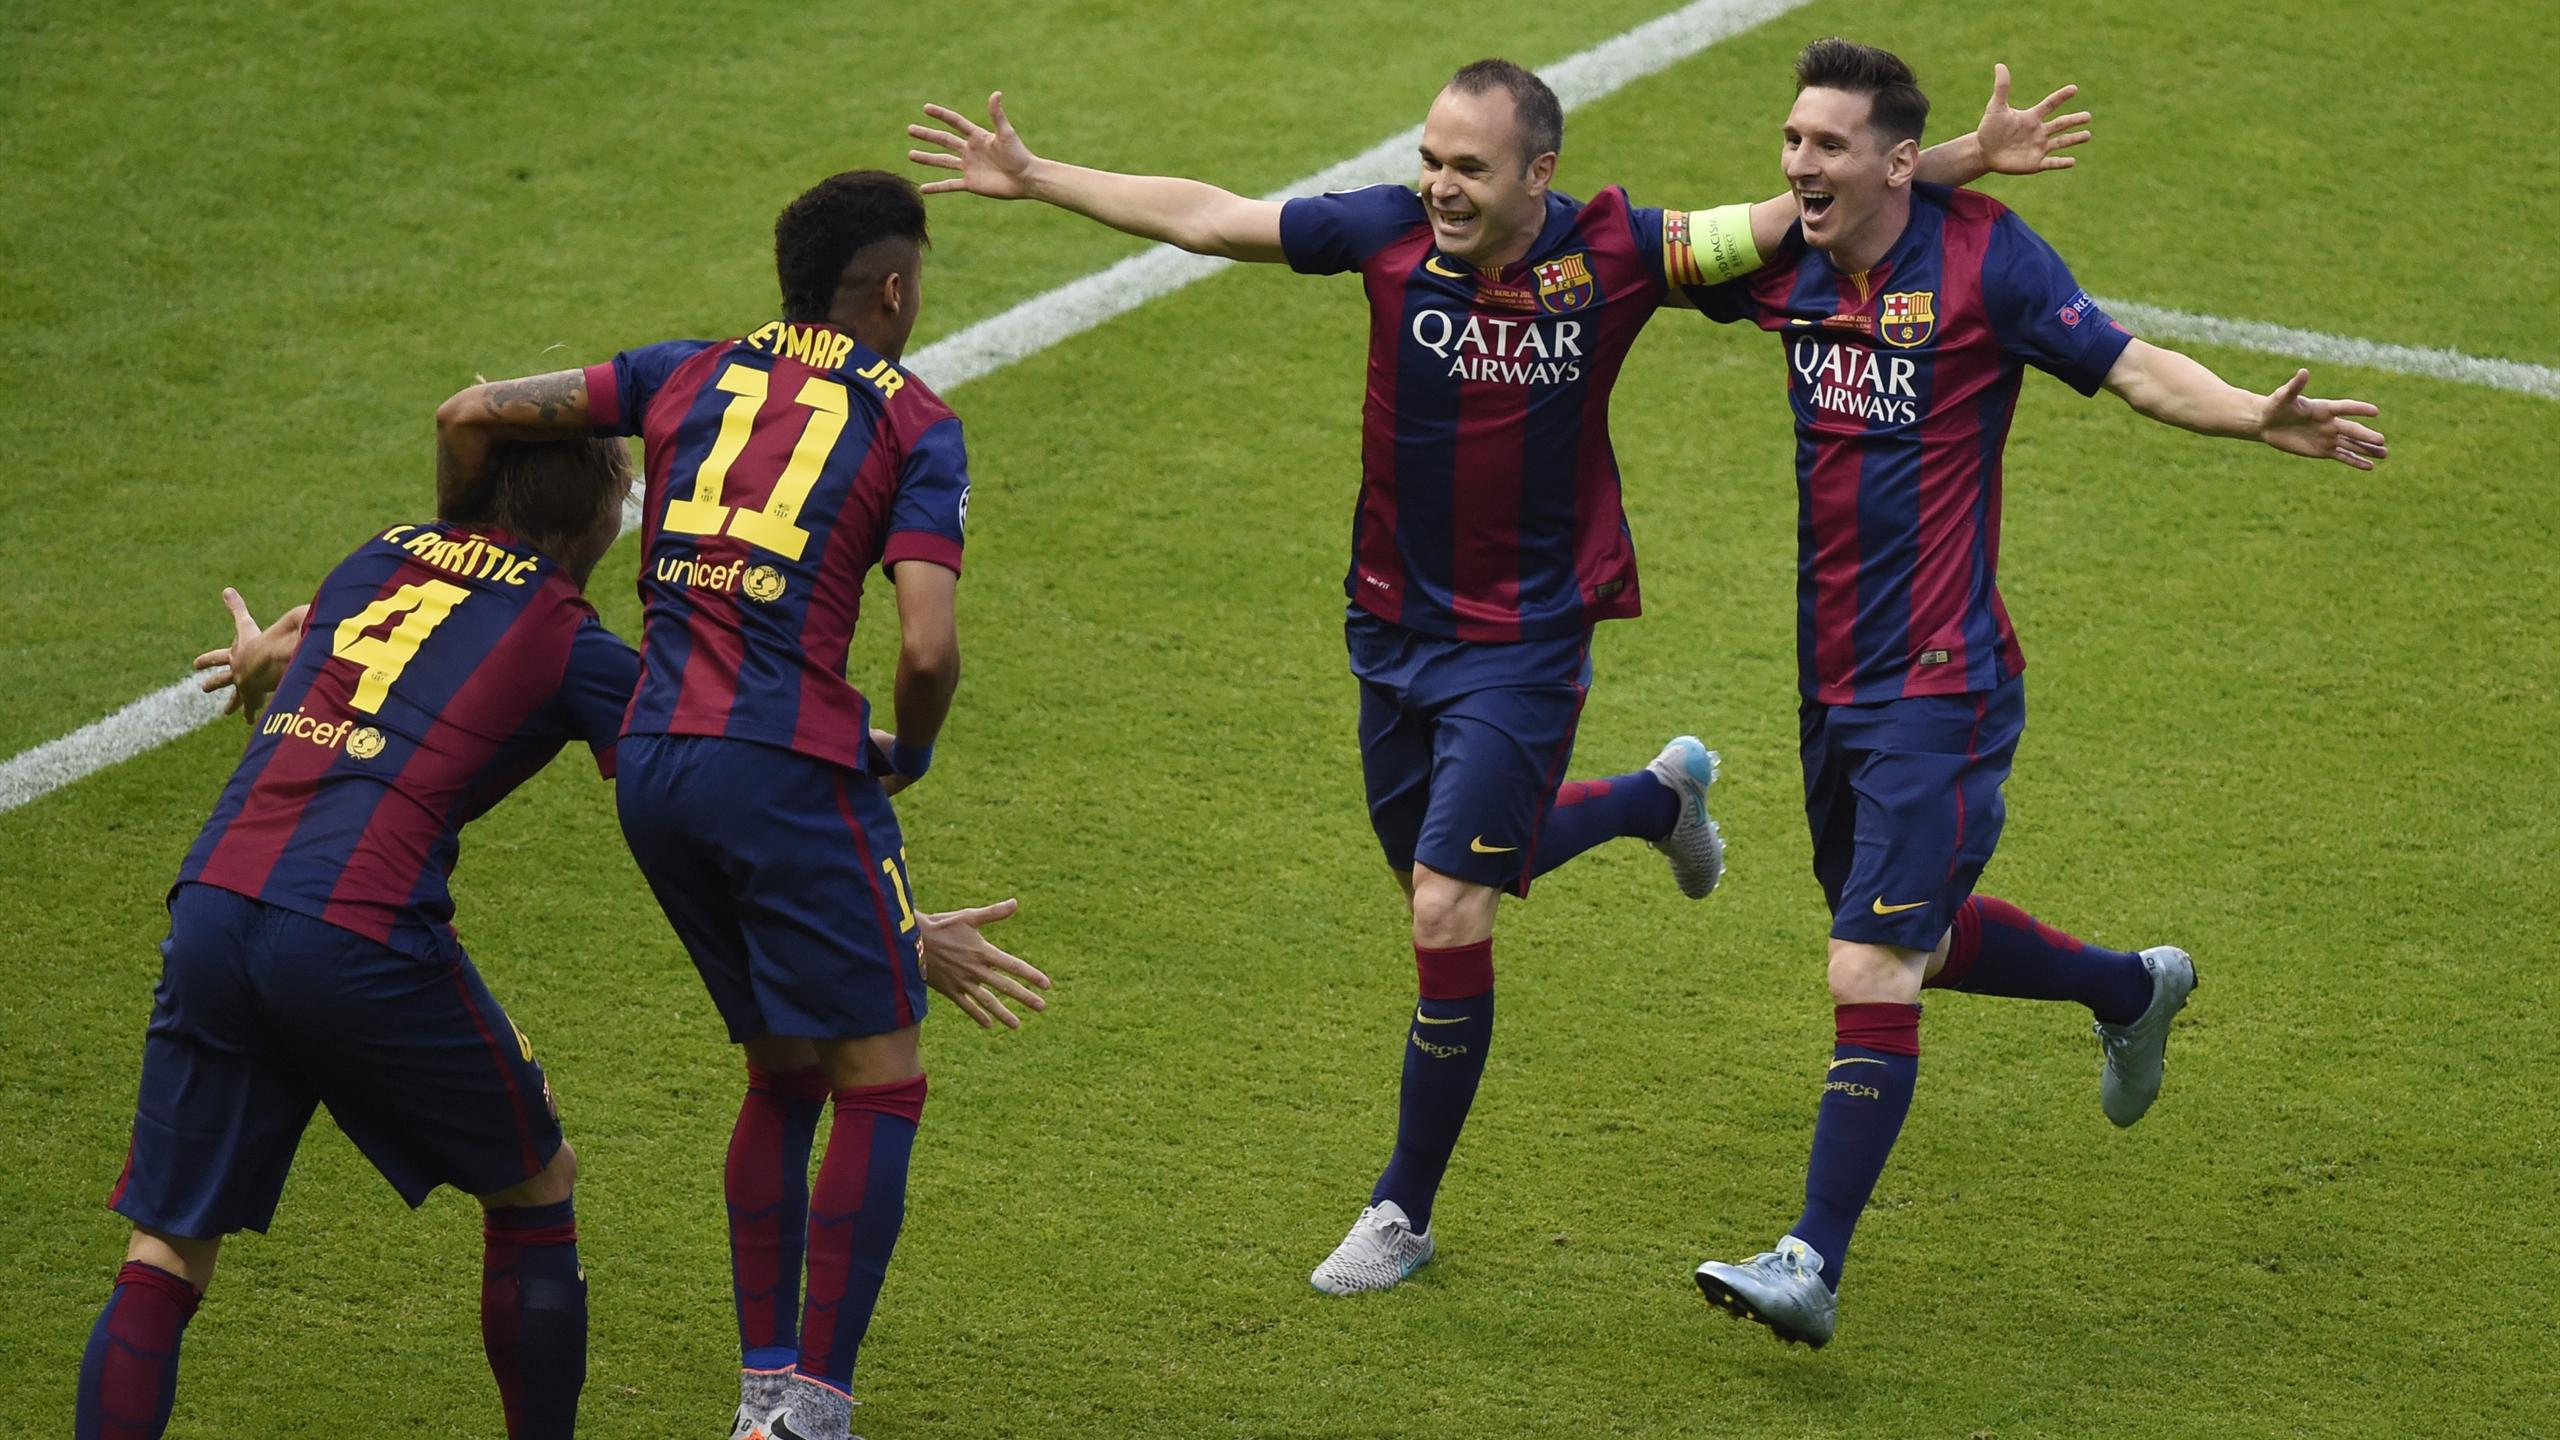 Iniesta, Messi, Neymar y Rakitic celebran un gol del Barcelona